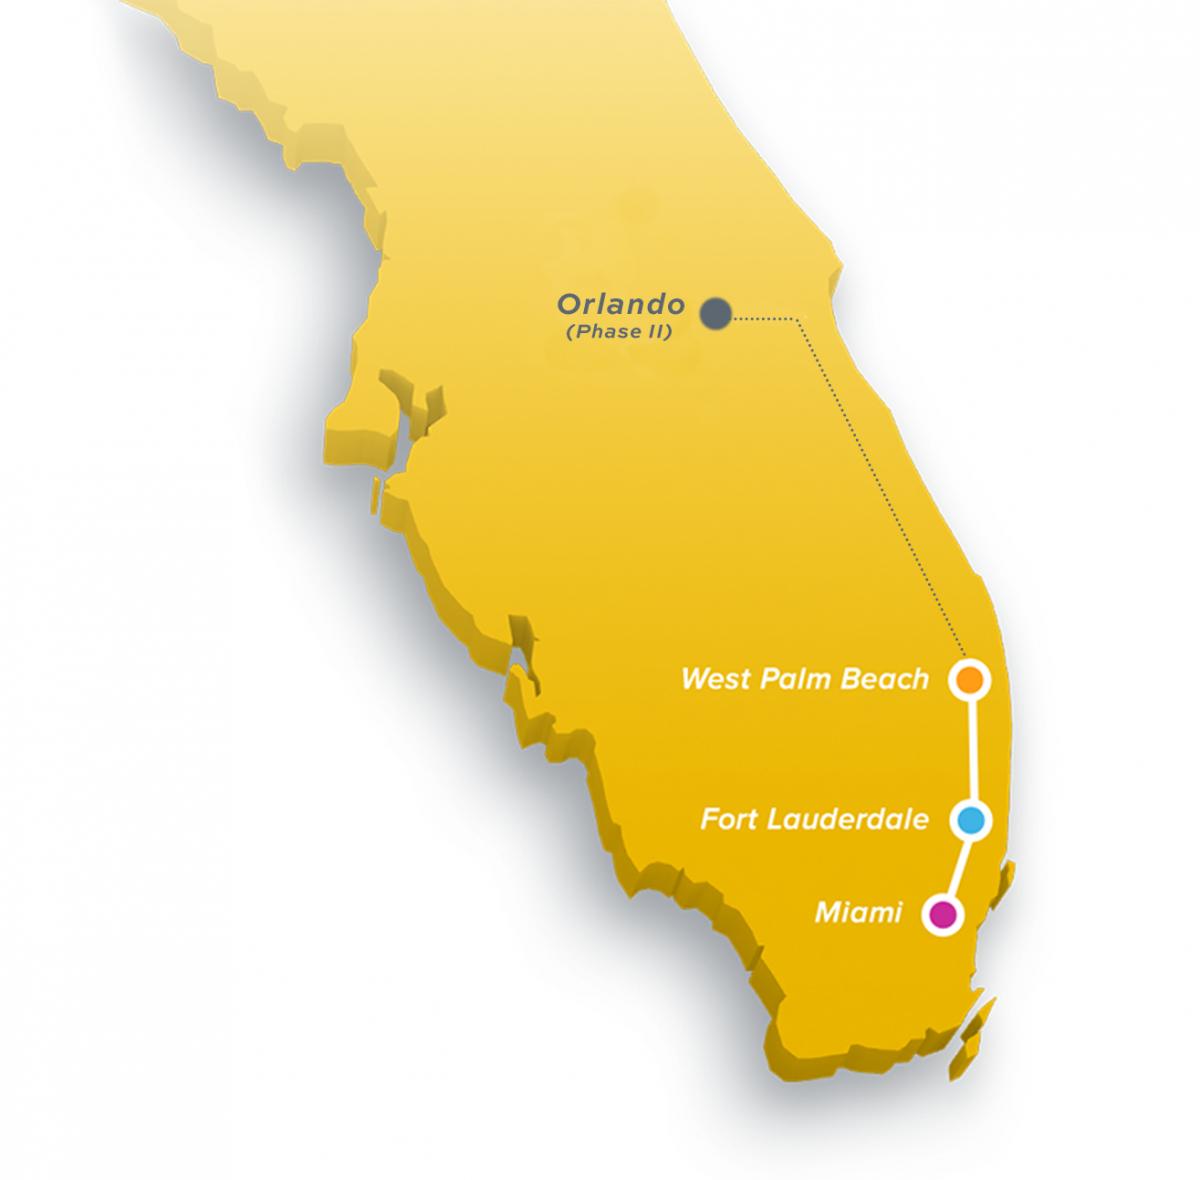 Brightline | The Palm Beaches Florida - Brightline Florida Map